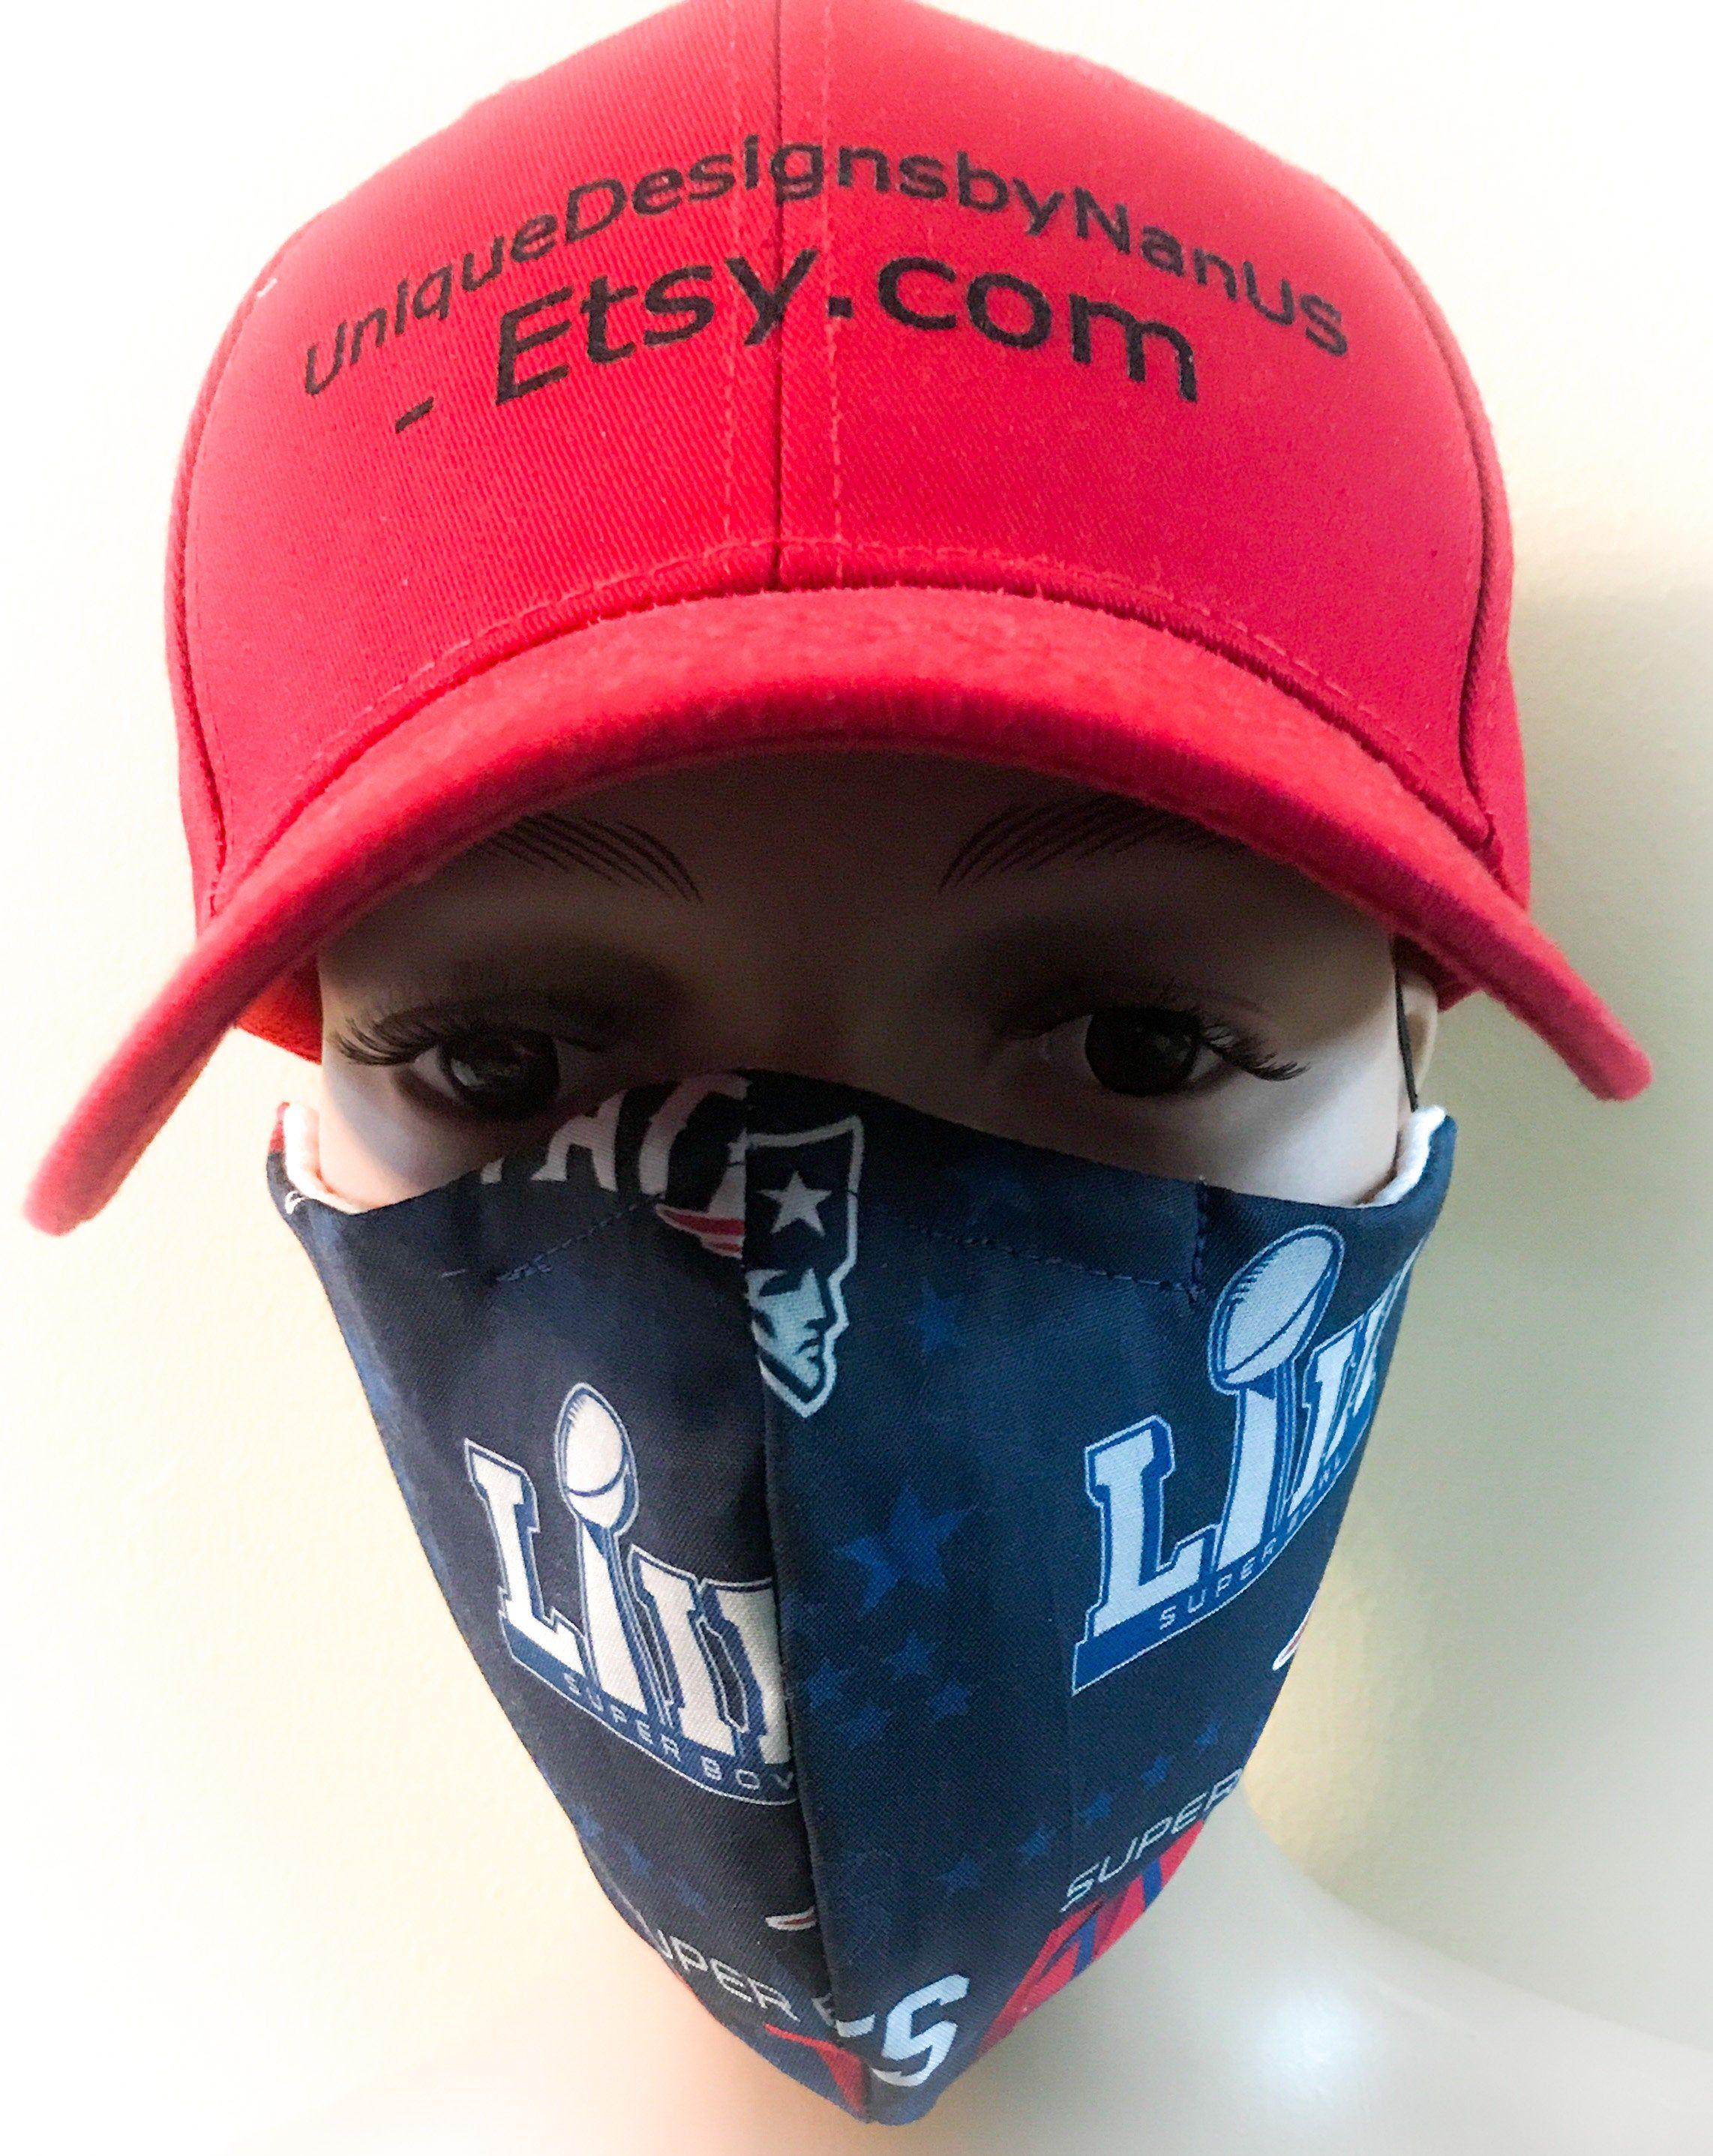 Patriots Mask Patriots Face Mask New England Patriots Mask Protective Face Mask Protective Mask Nfl Face M In 2020 Mask For Kids Face Mask Beaded Leather Bracelet